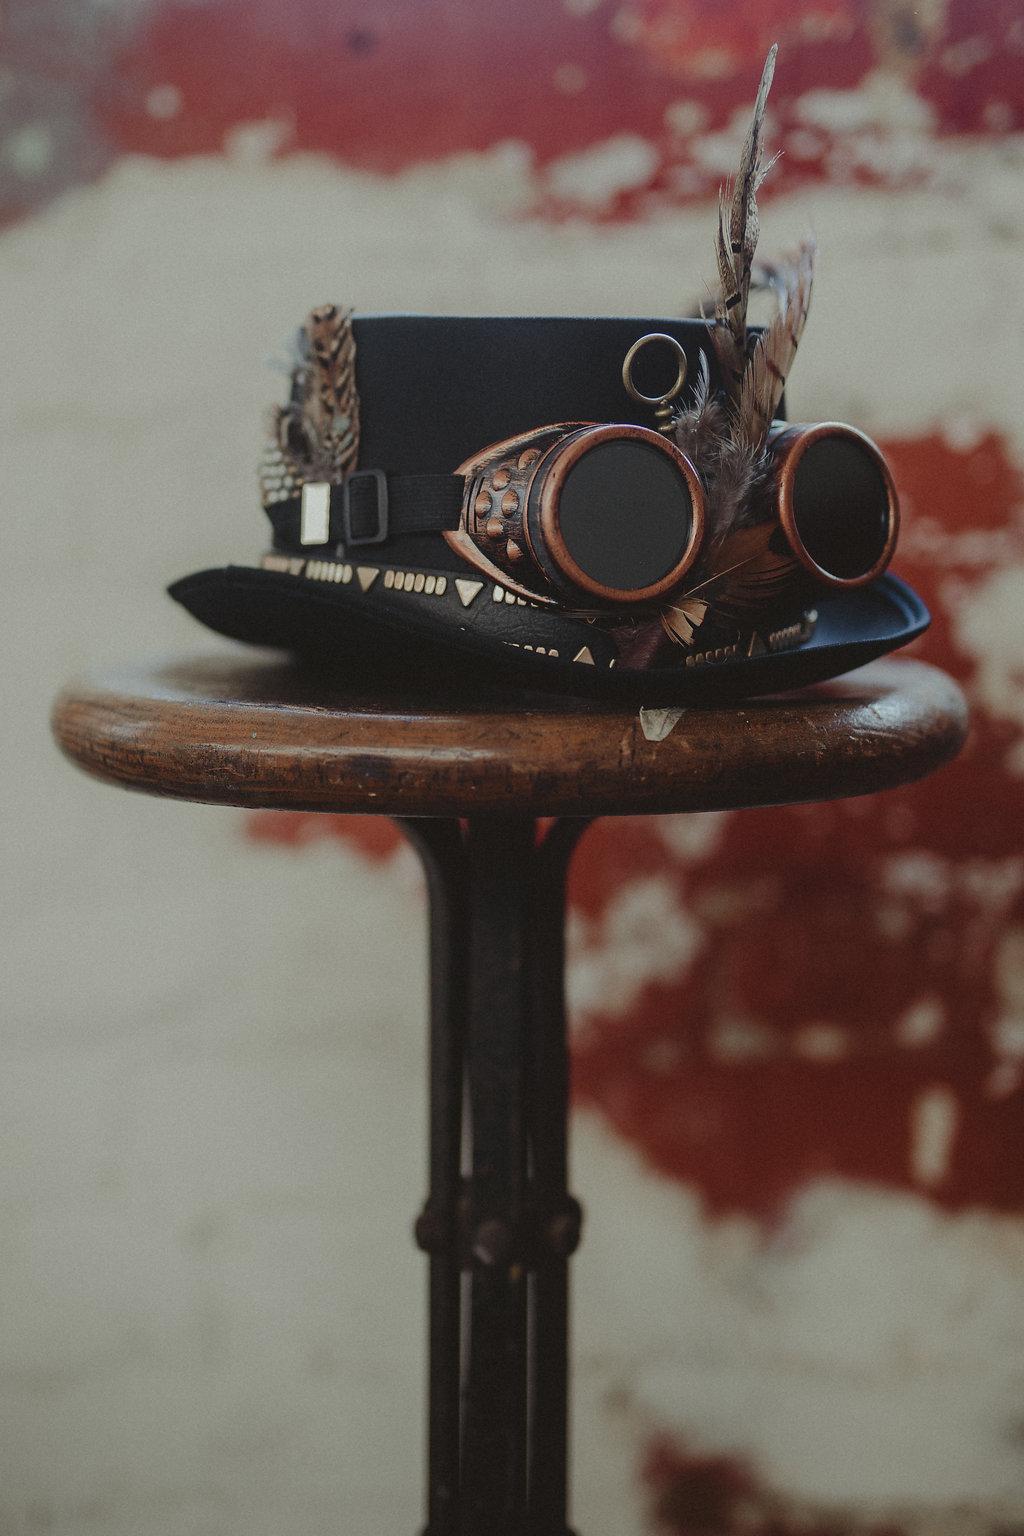 Studio Fotografico Bacci - Steampunk wedding - alternative wedding 20